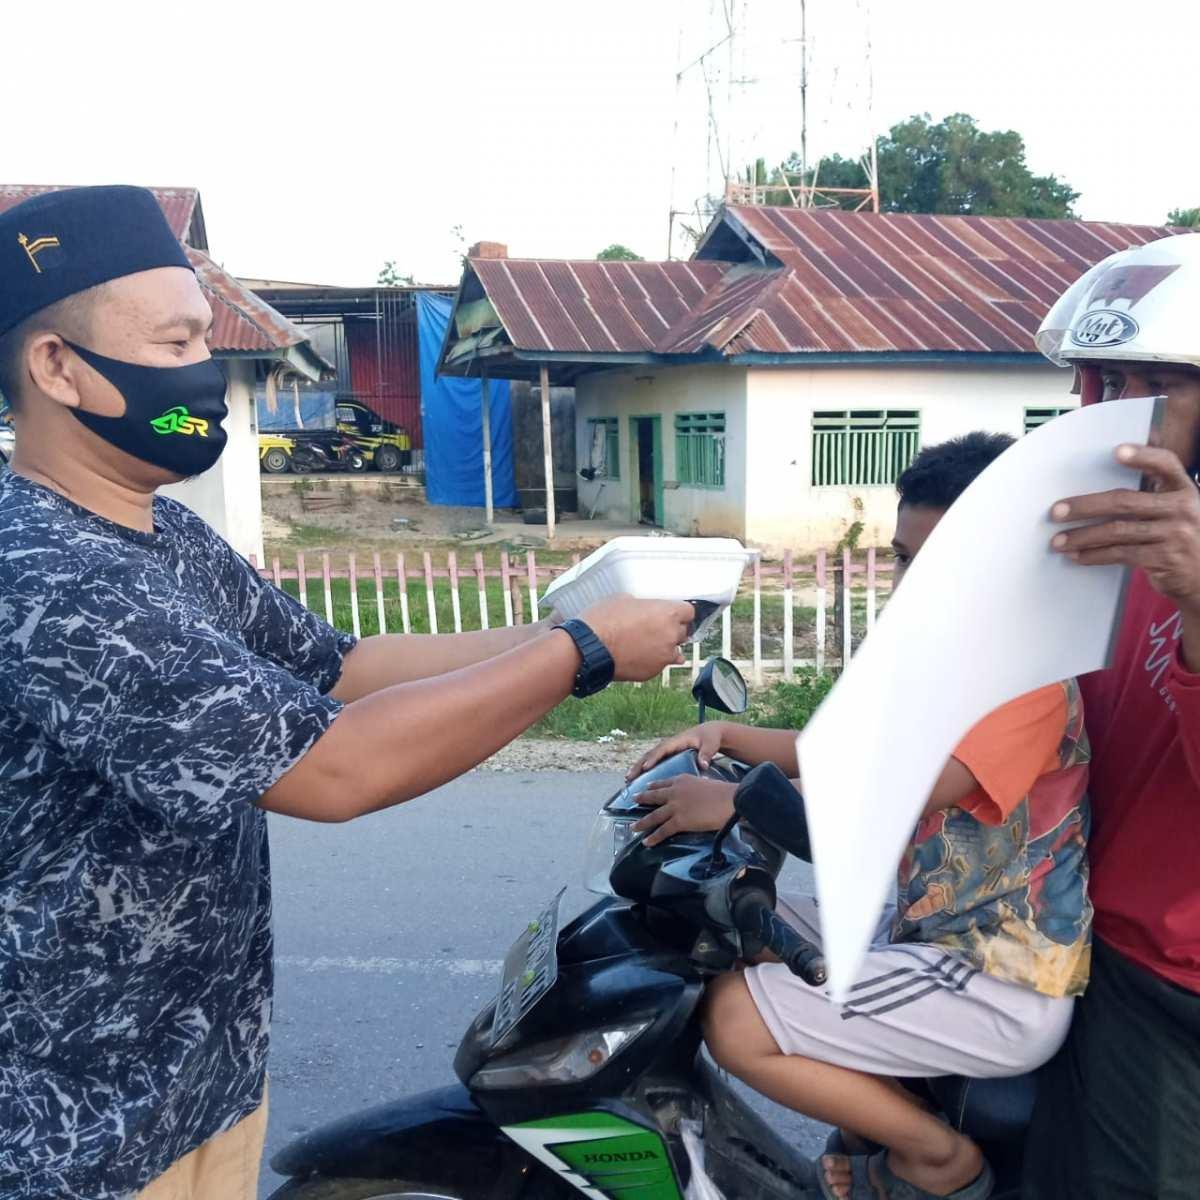 Jelang Berbuka Puasa, ASR Konsel Berbagi Makanan dan Masker